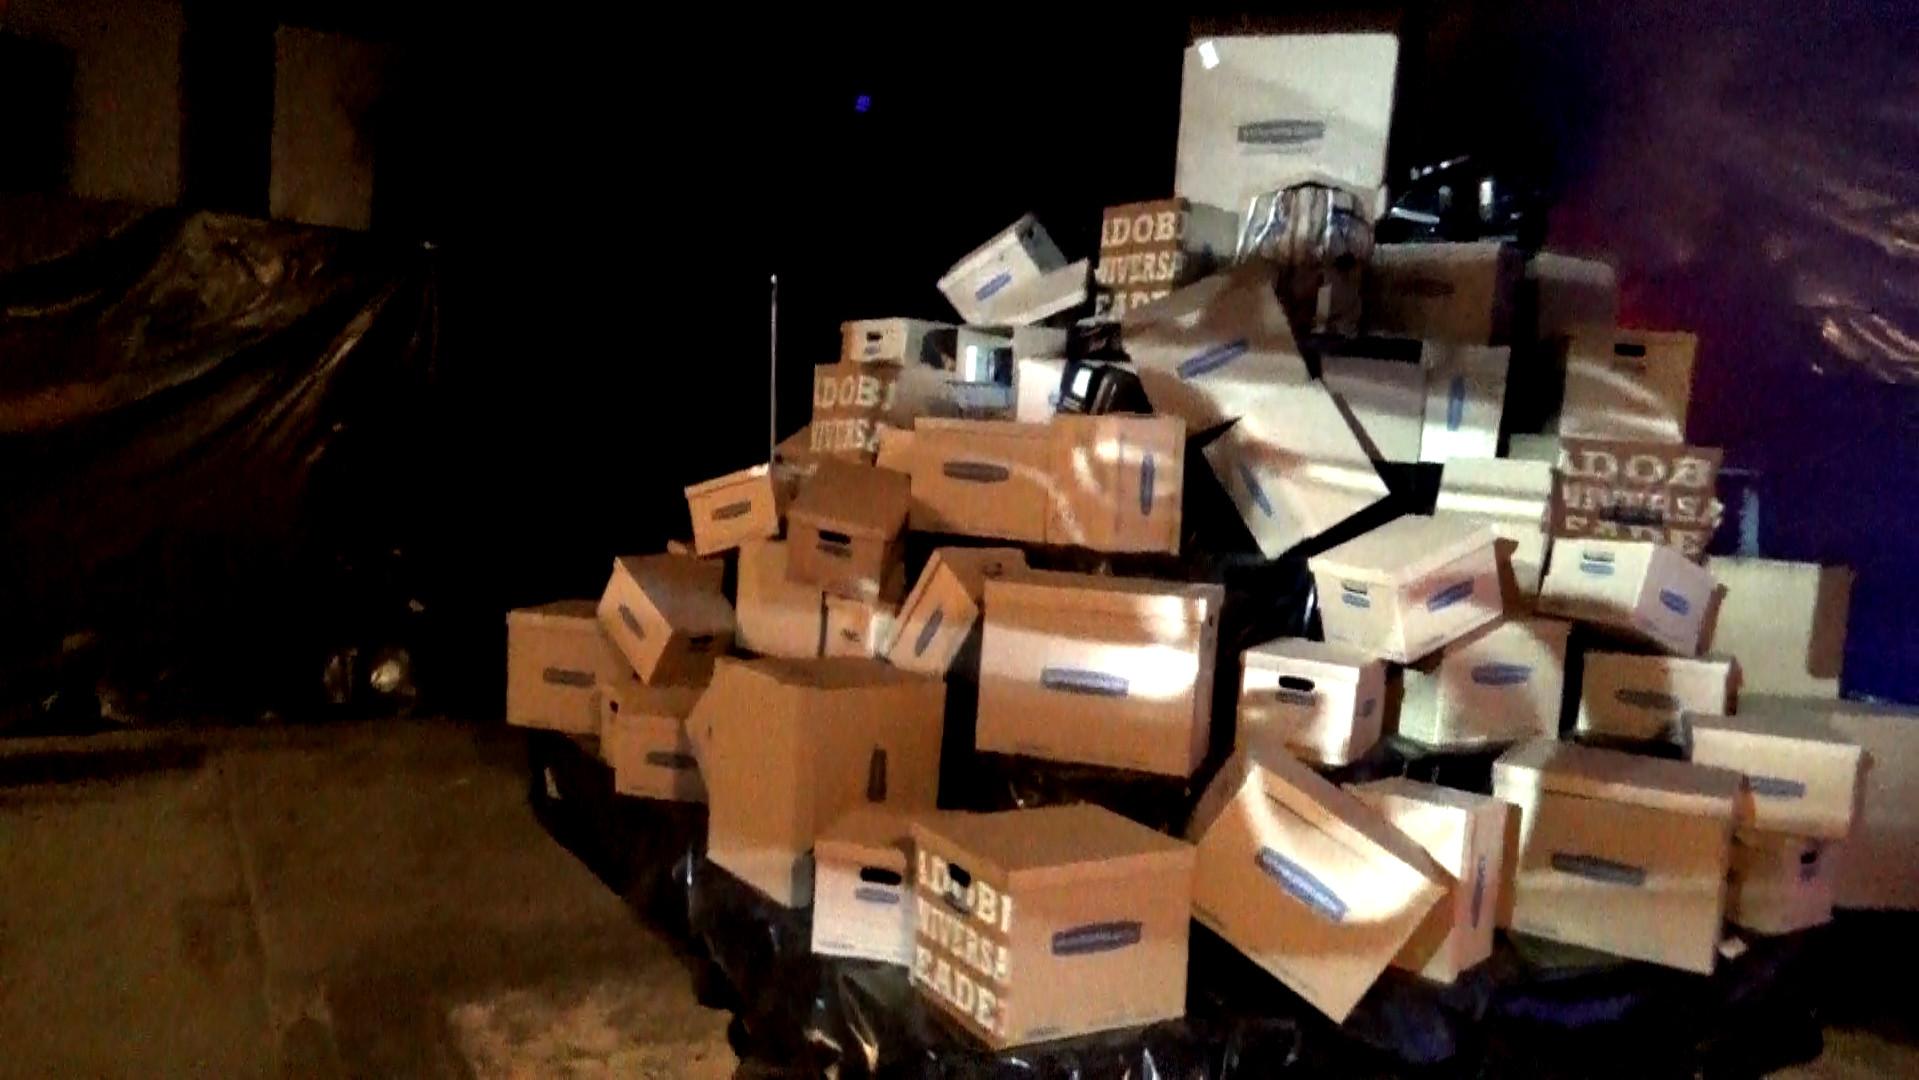 Video on Box Sculpture 1920x1080.jpg